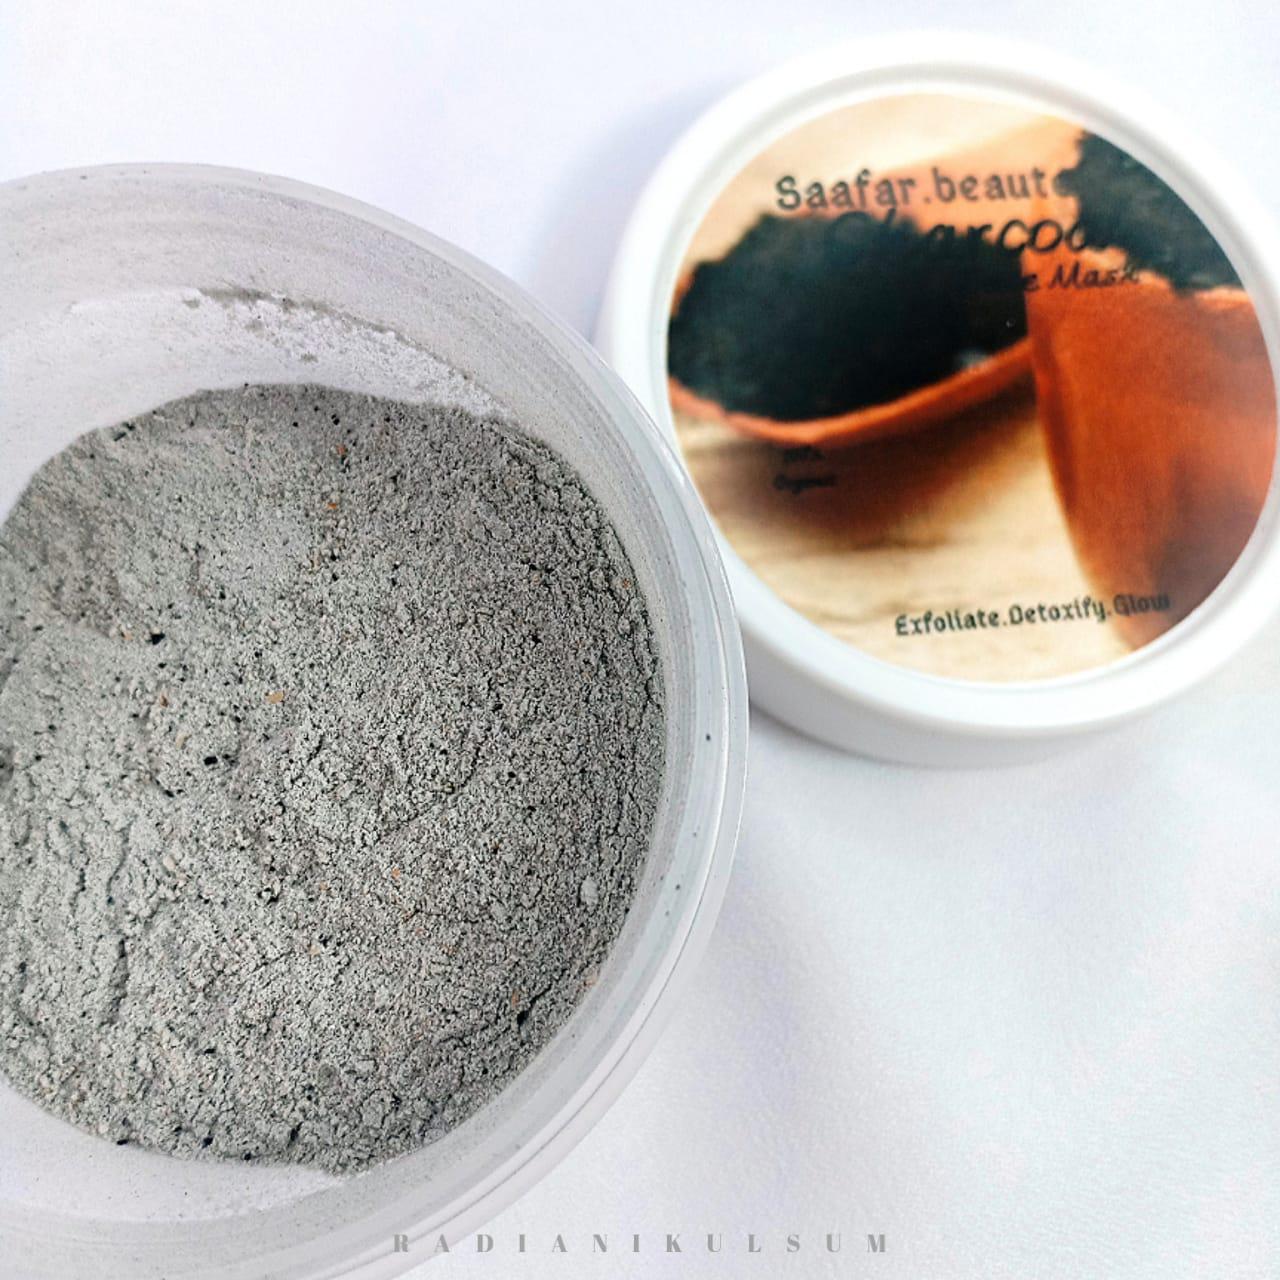 Saafar Beaute Charcoal Face Mask